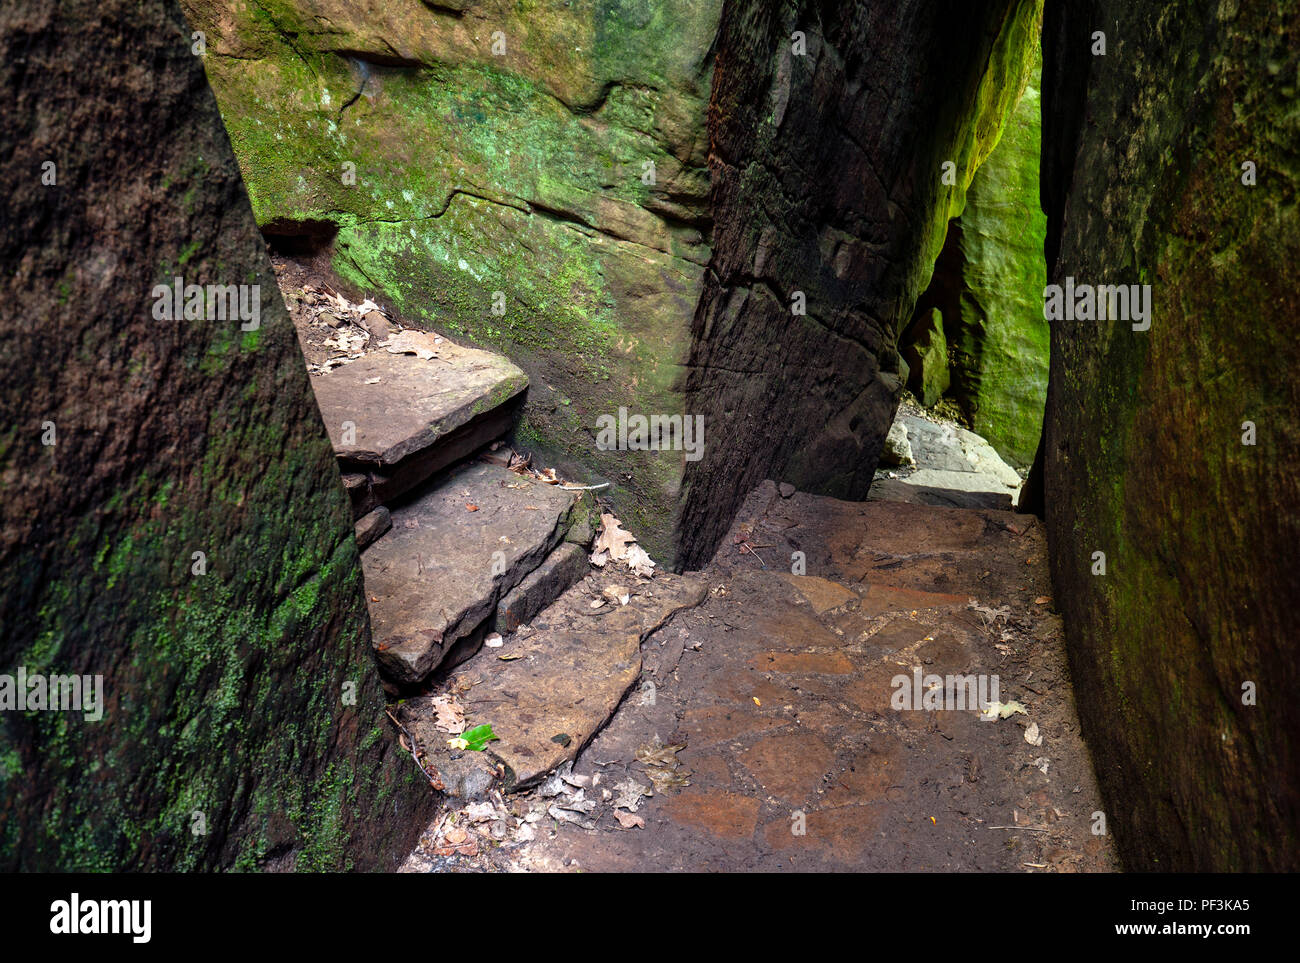 Rim Rock National Recreation Trail, Shawnee National Forest, Illinois, USA - Stock Image